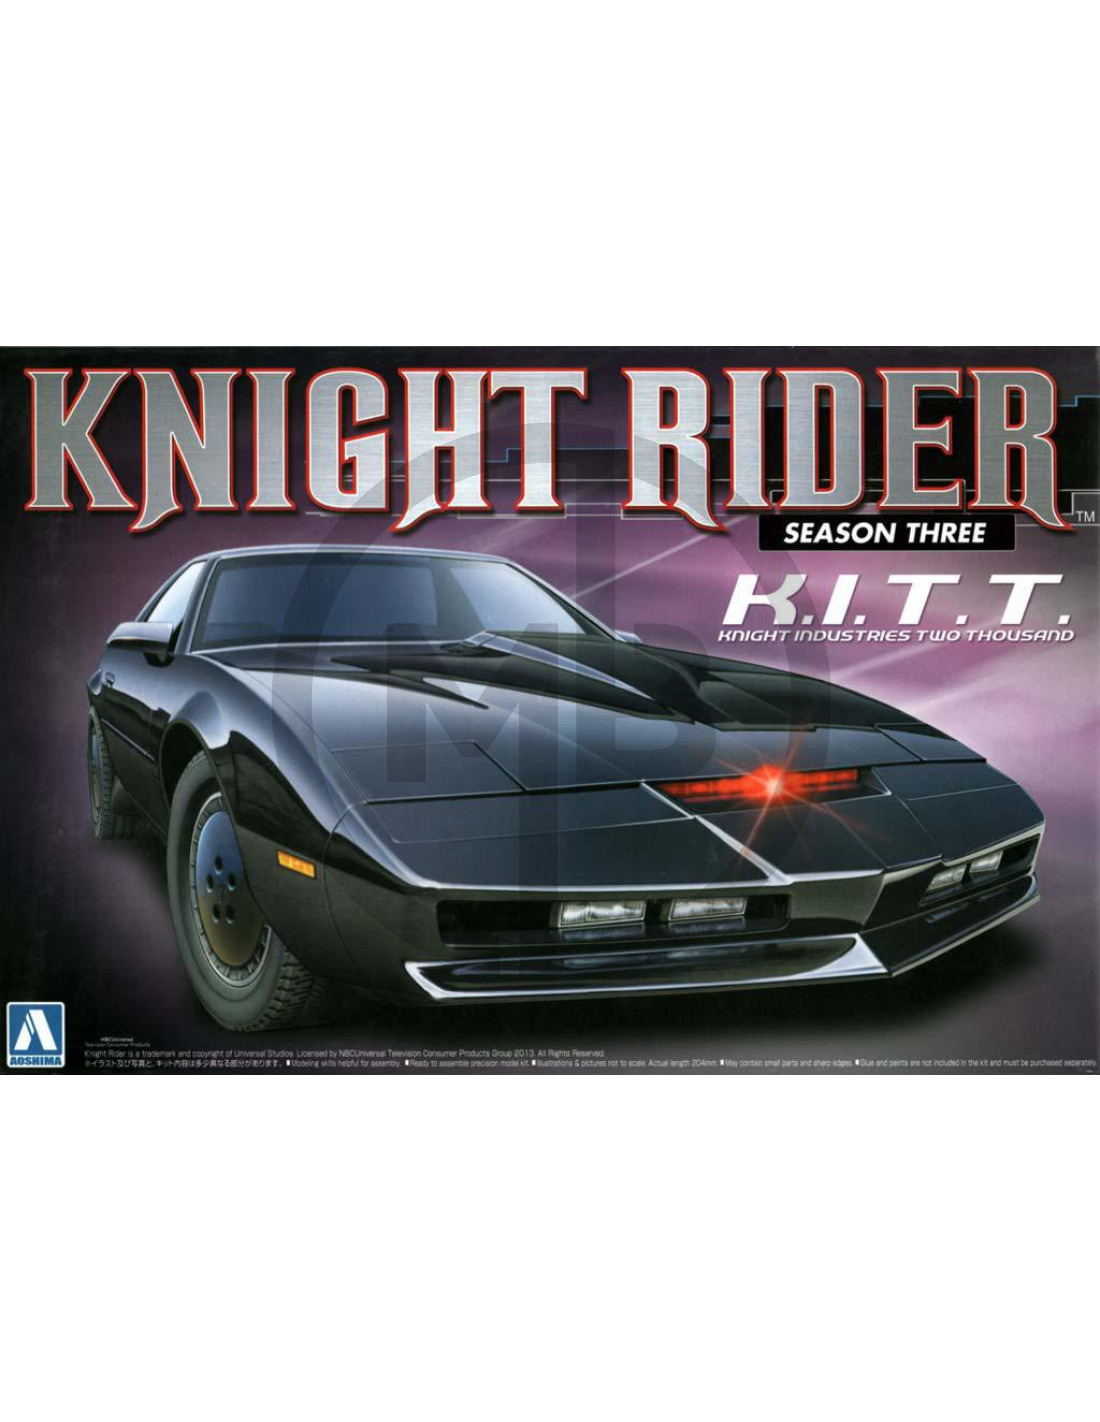 k i t t knight rider season 3. Black Bedroom Furniture Sets. Home Design Ideas